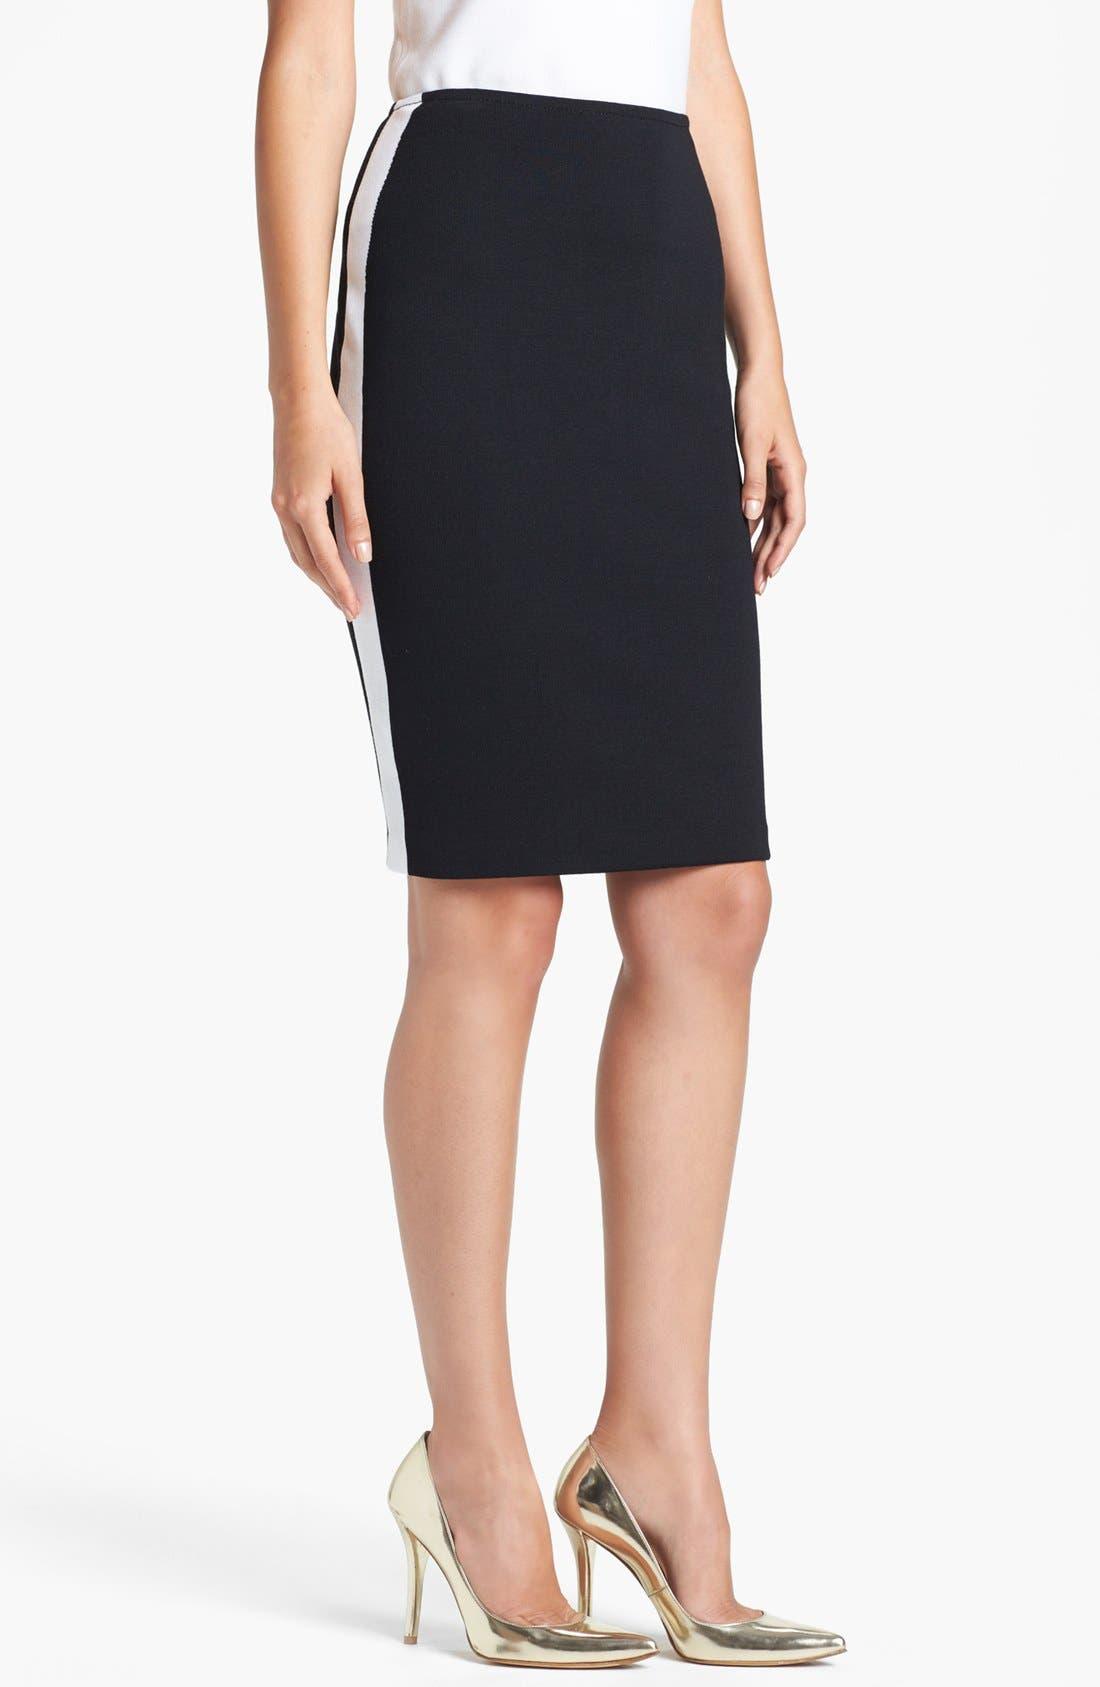 Alternate Image 1 Selected - St. John Collection Side Stripe Milano Knit Pencil Skirt